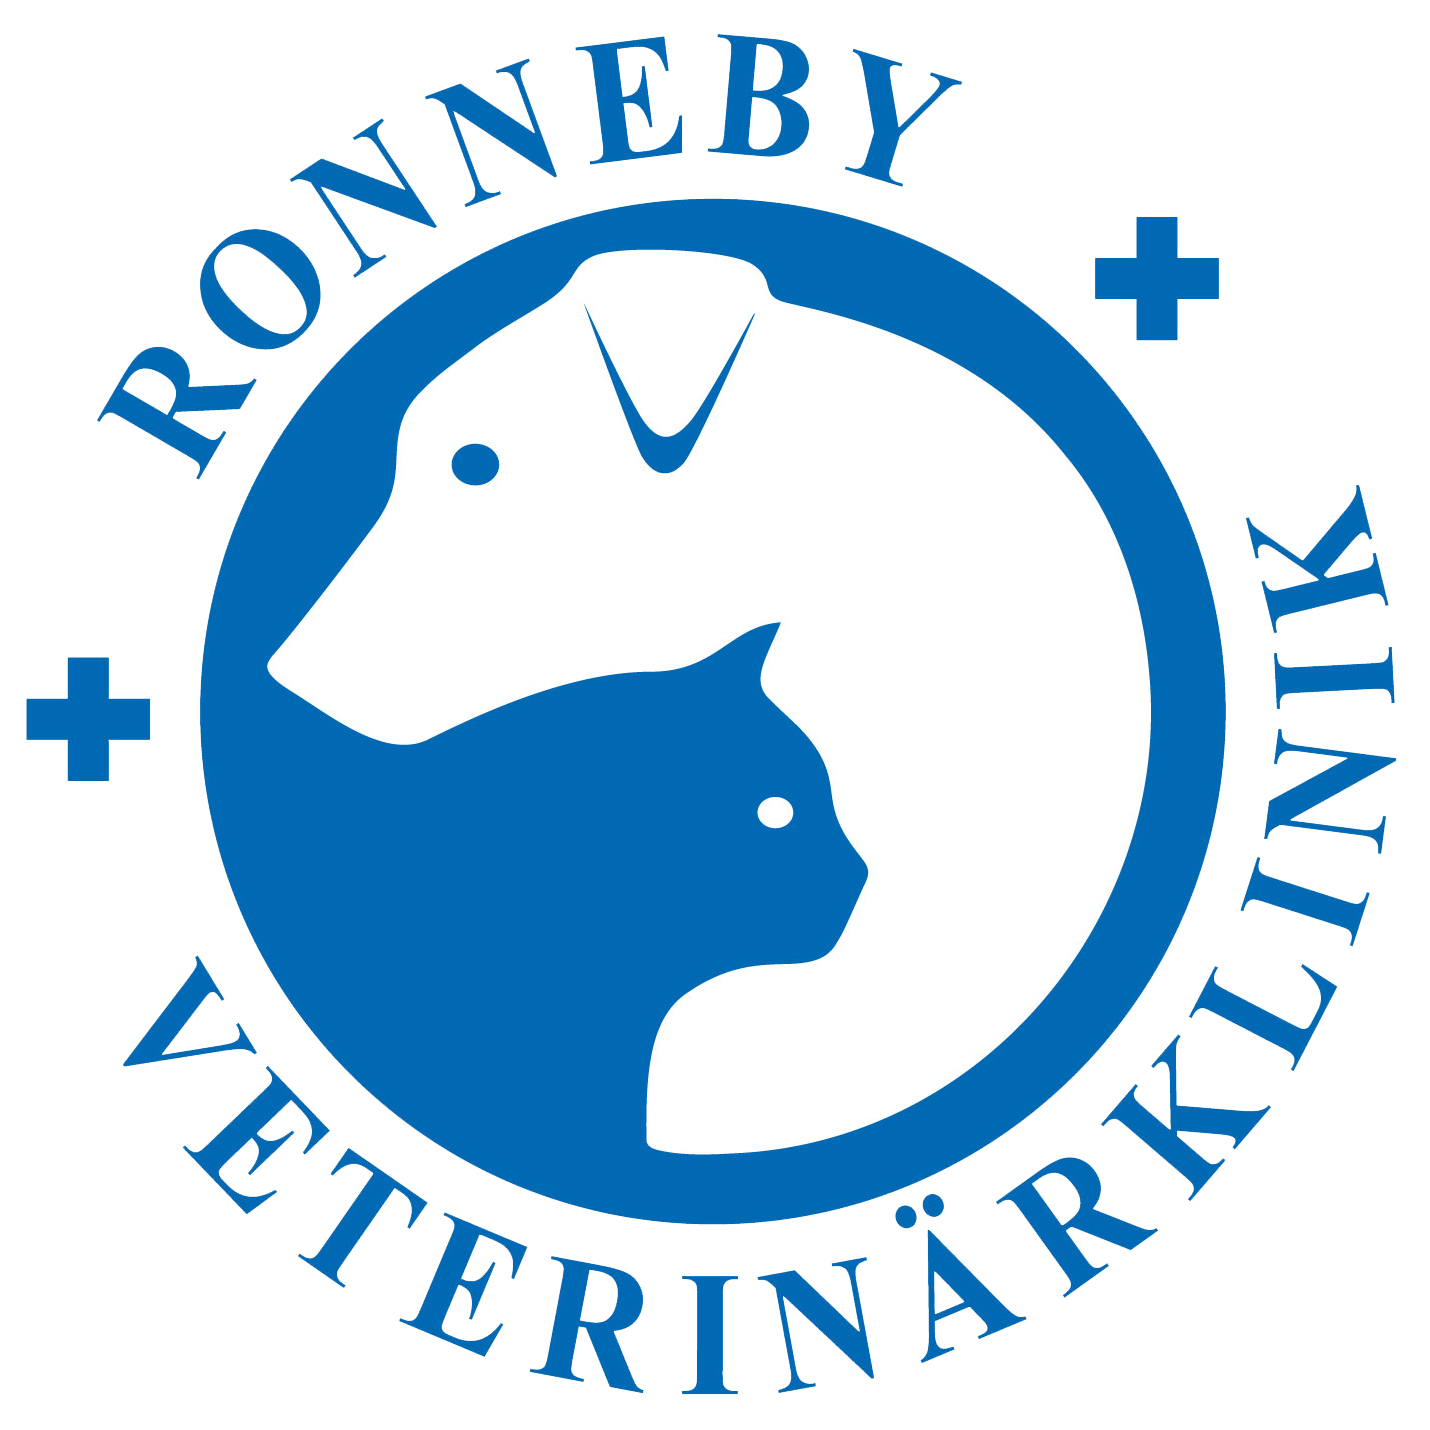 Ronneby Veterinärklinik AB